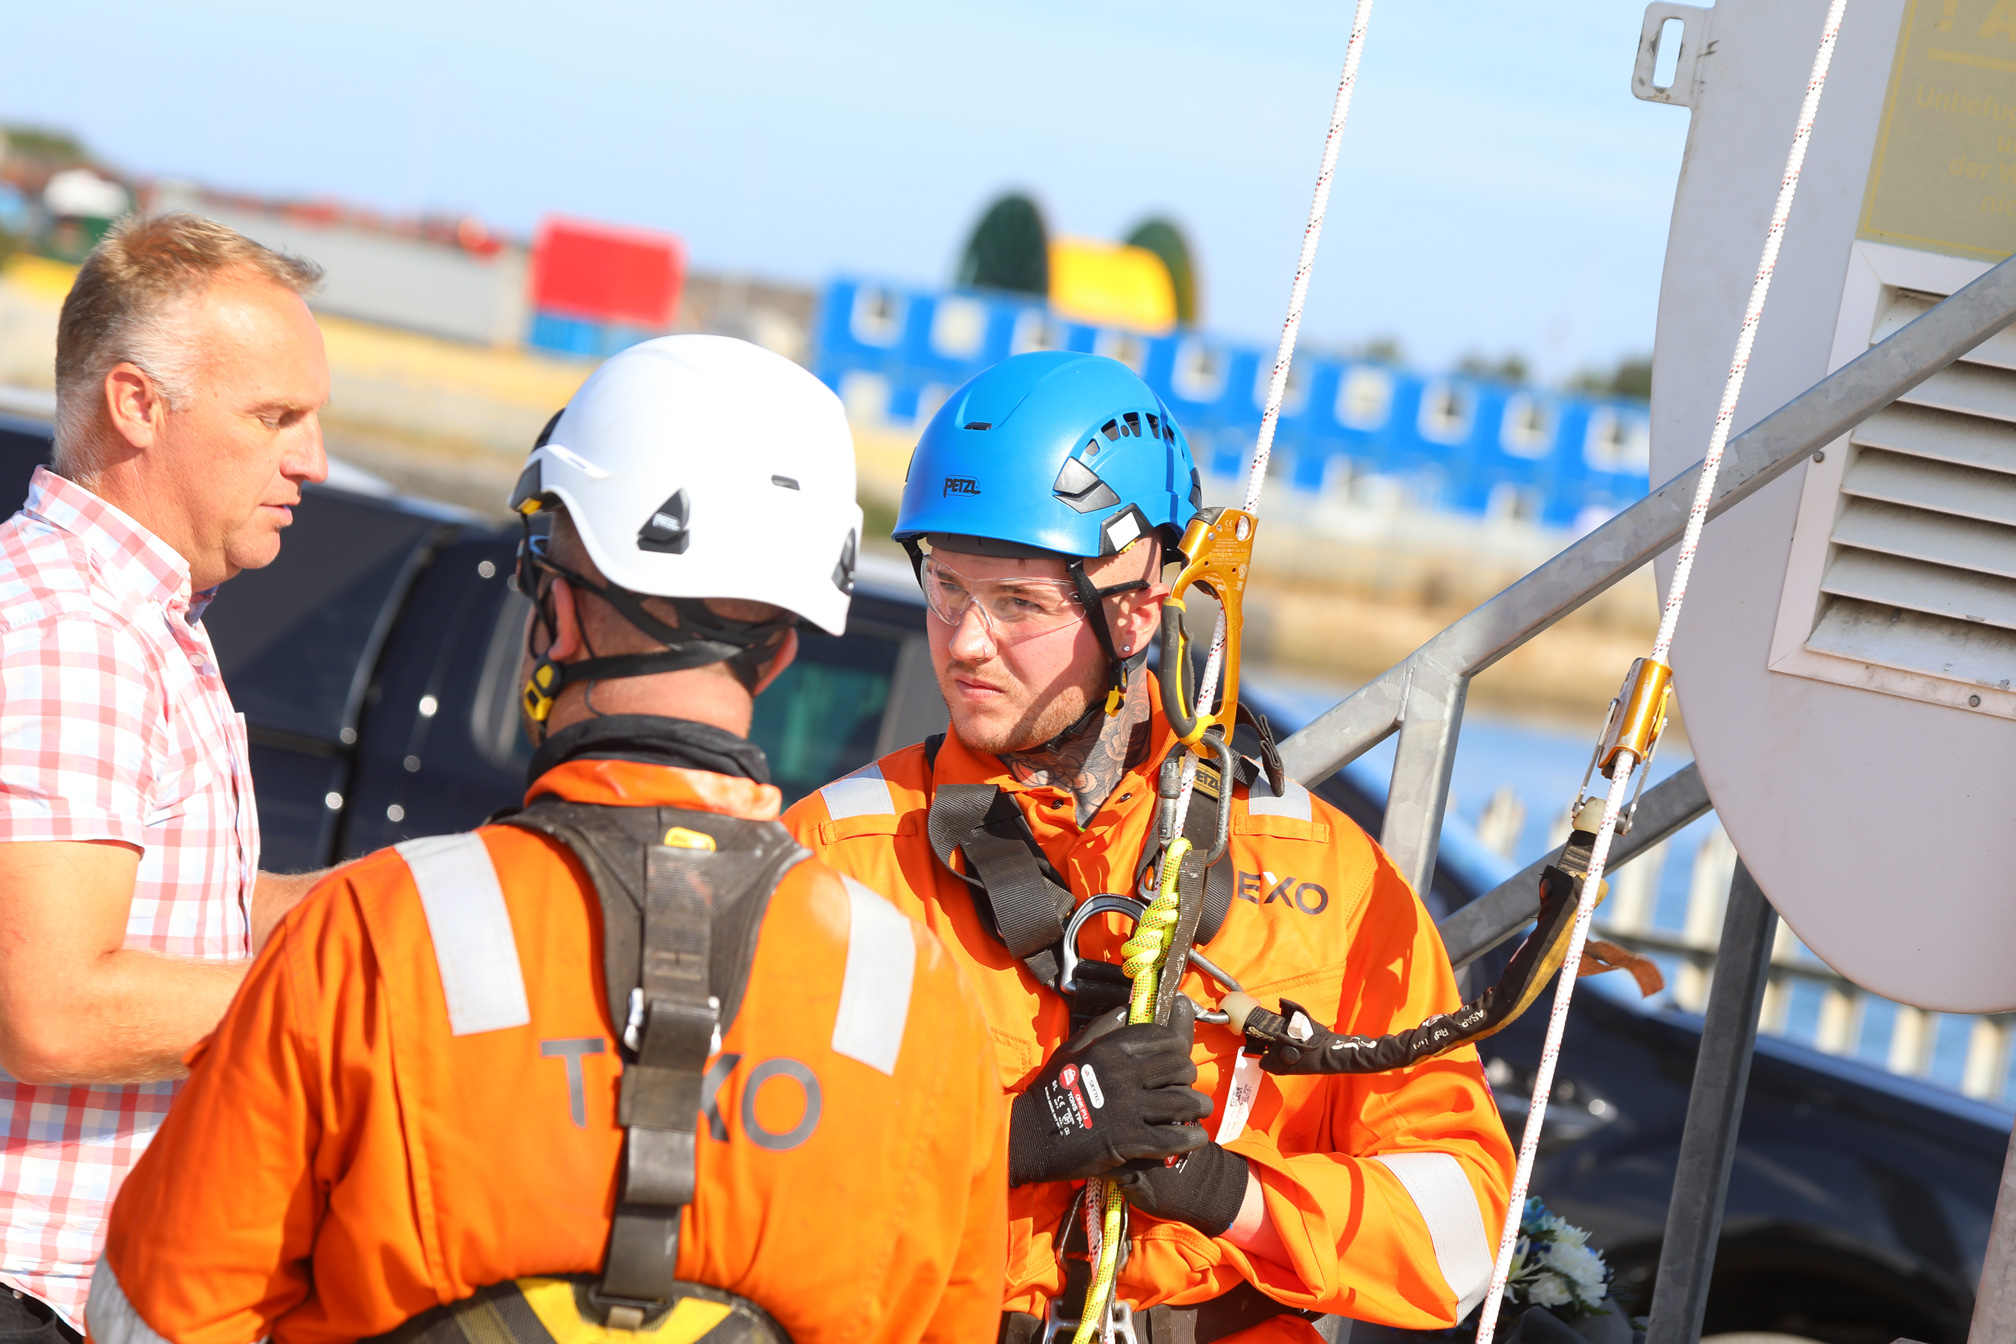 £1m Wind Turbine Training Facility Opens at Port of Blyth